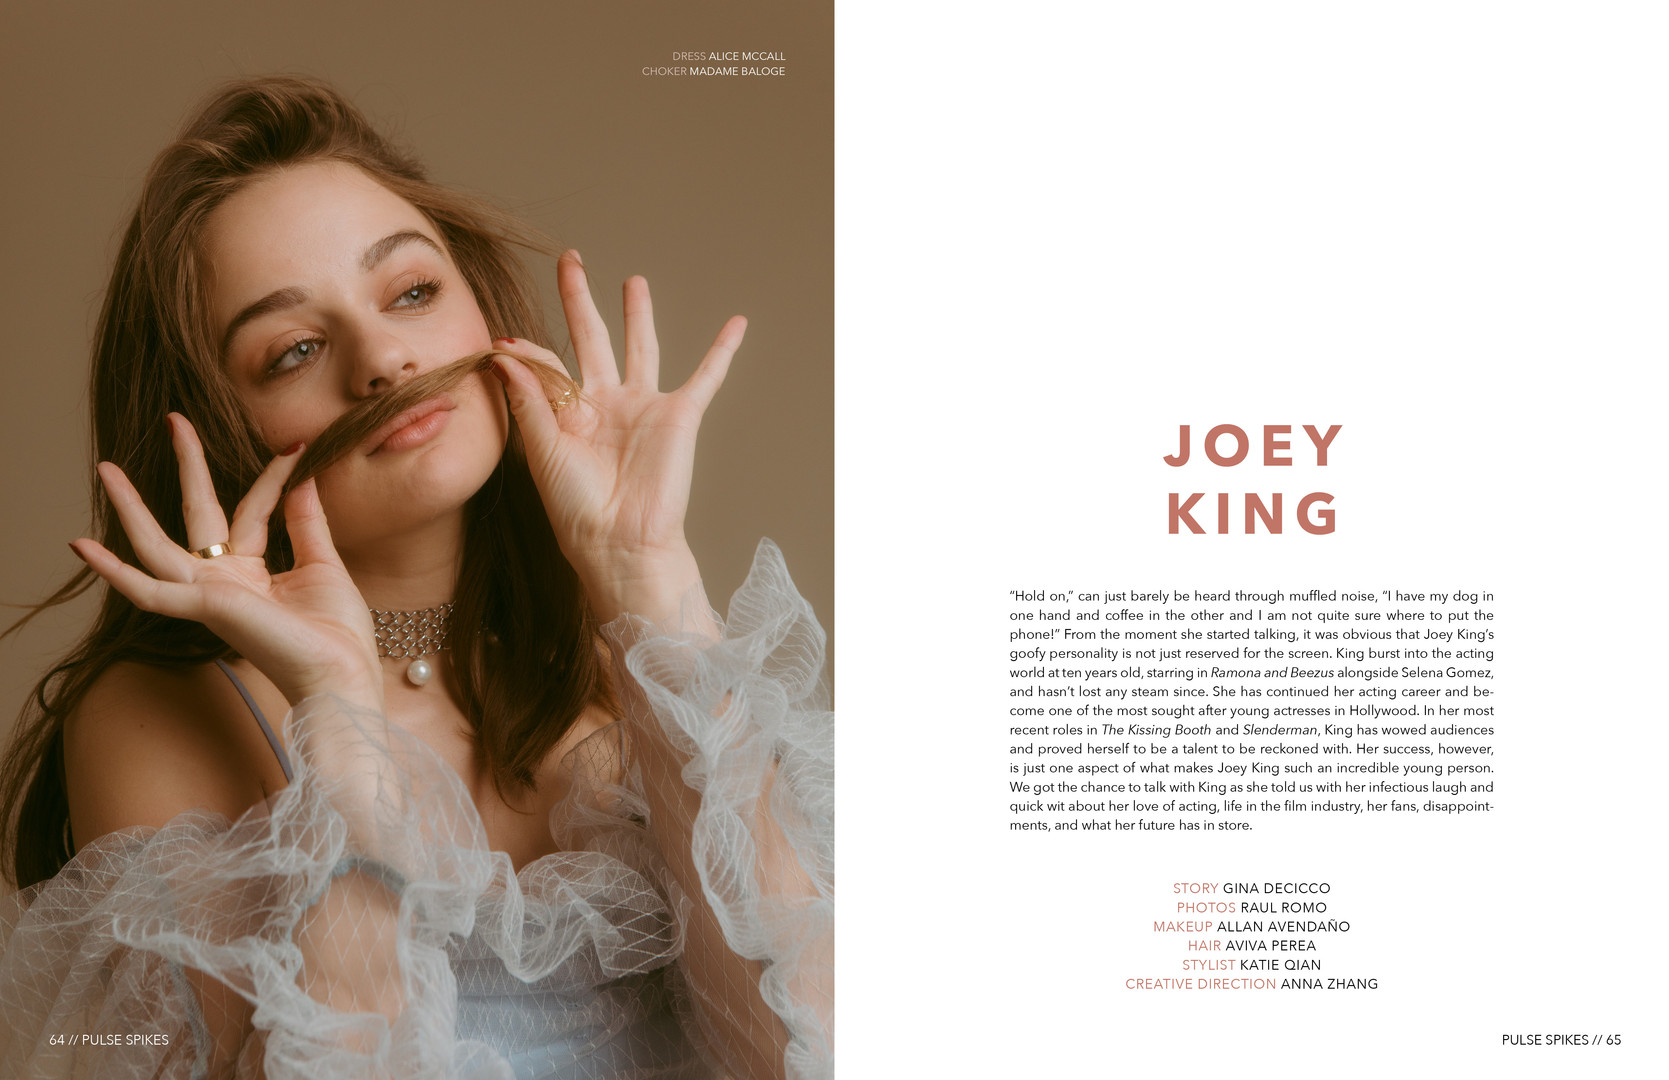 Joey King - Pulse Spikes 2.jpg